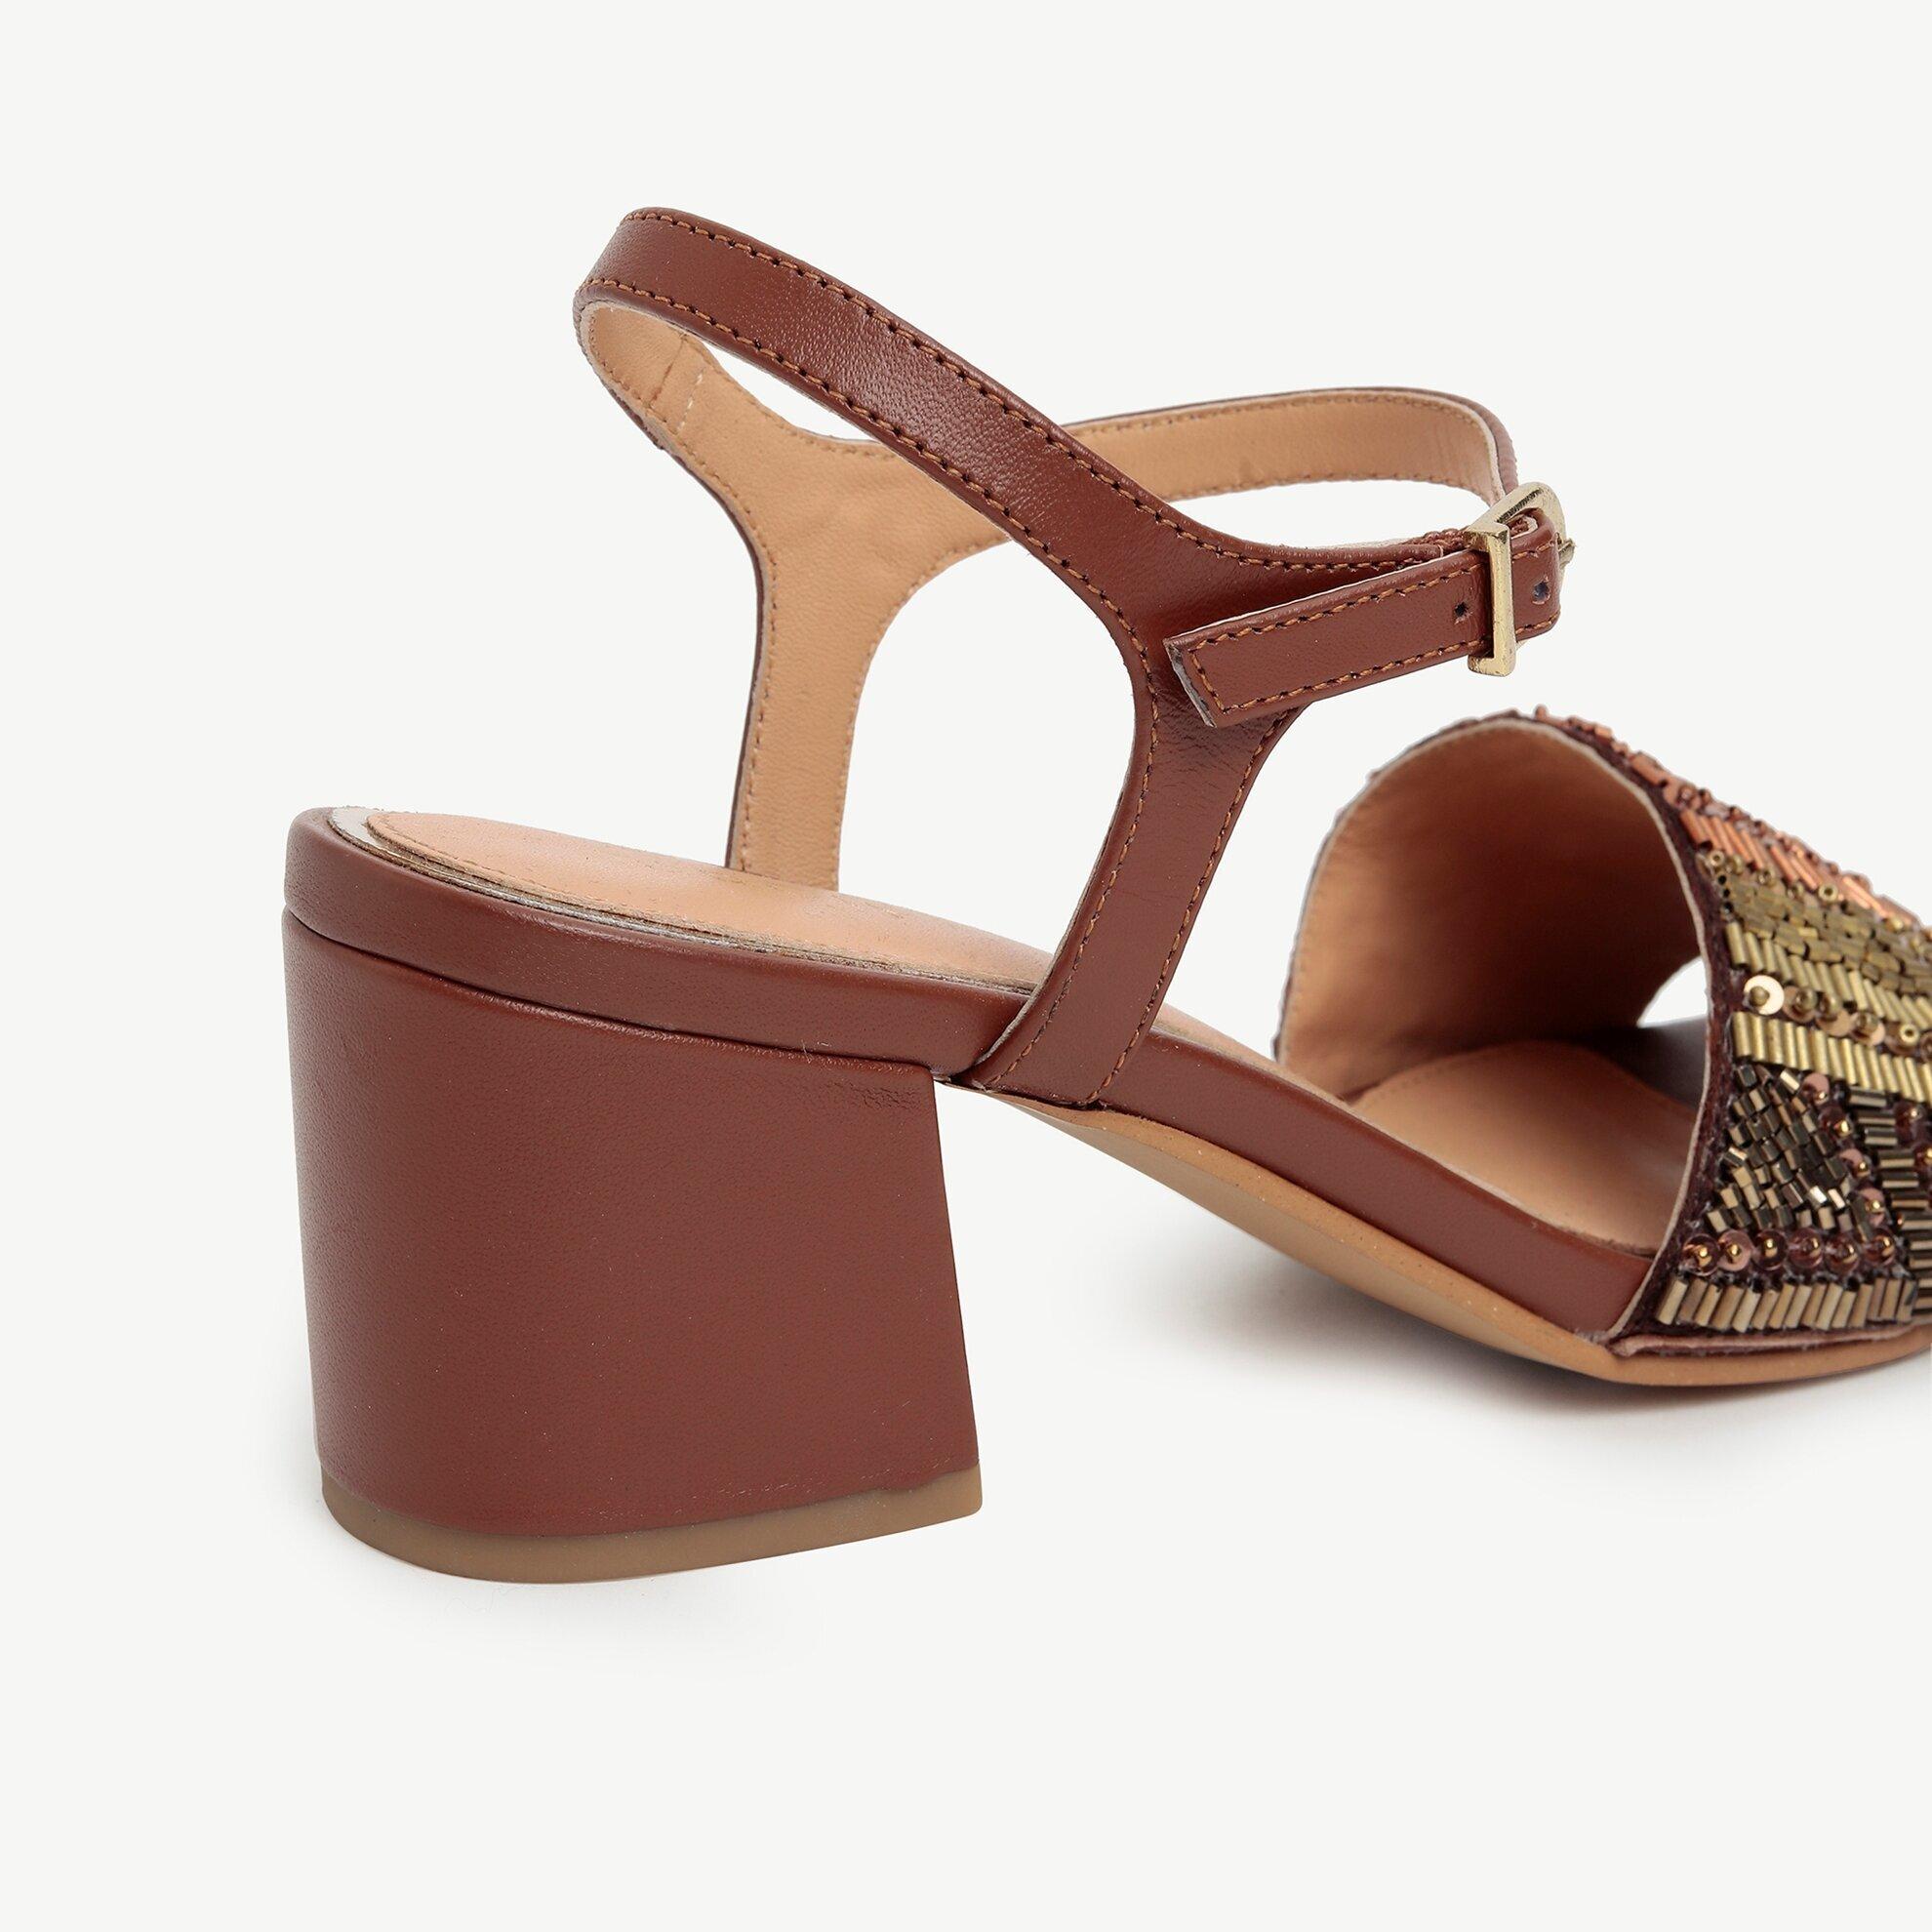 Boncuk İşlemeli Topuklu Sandalet